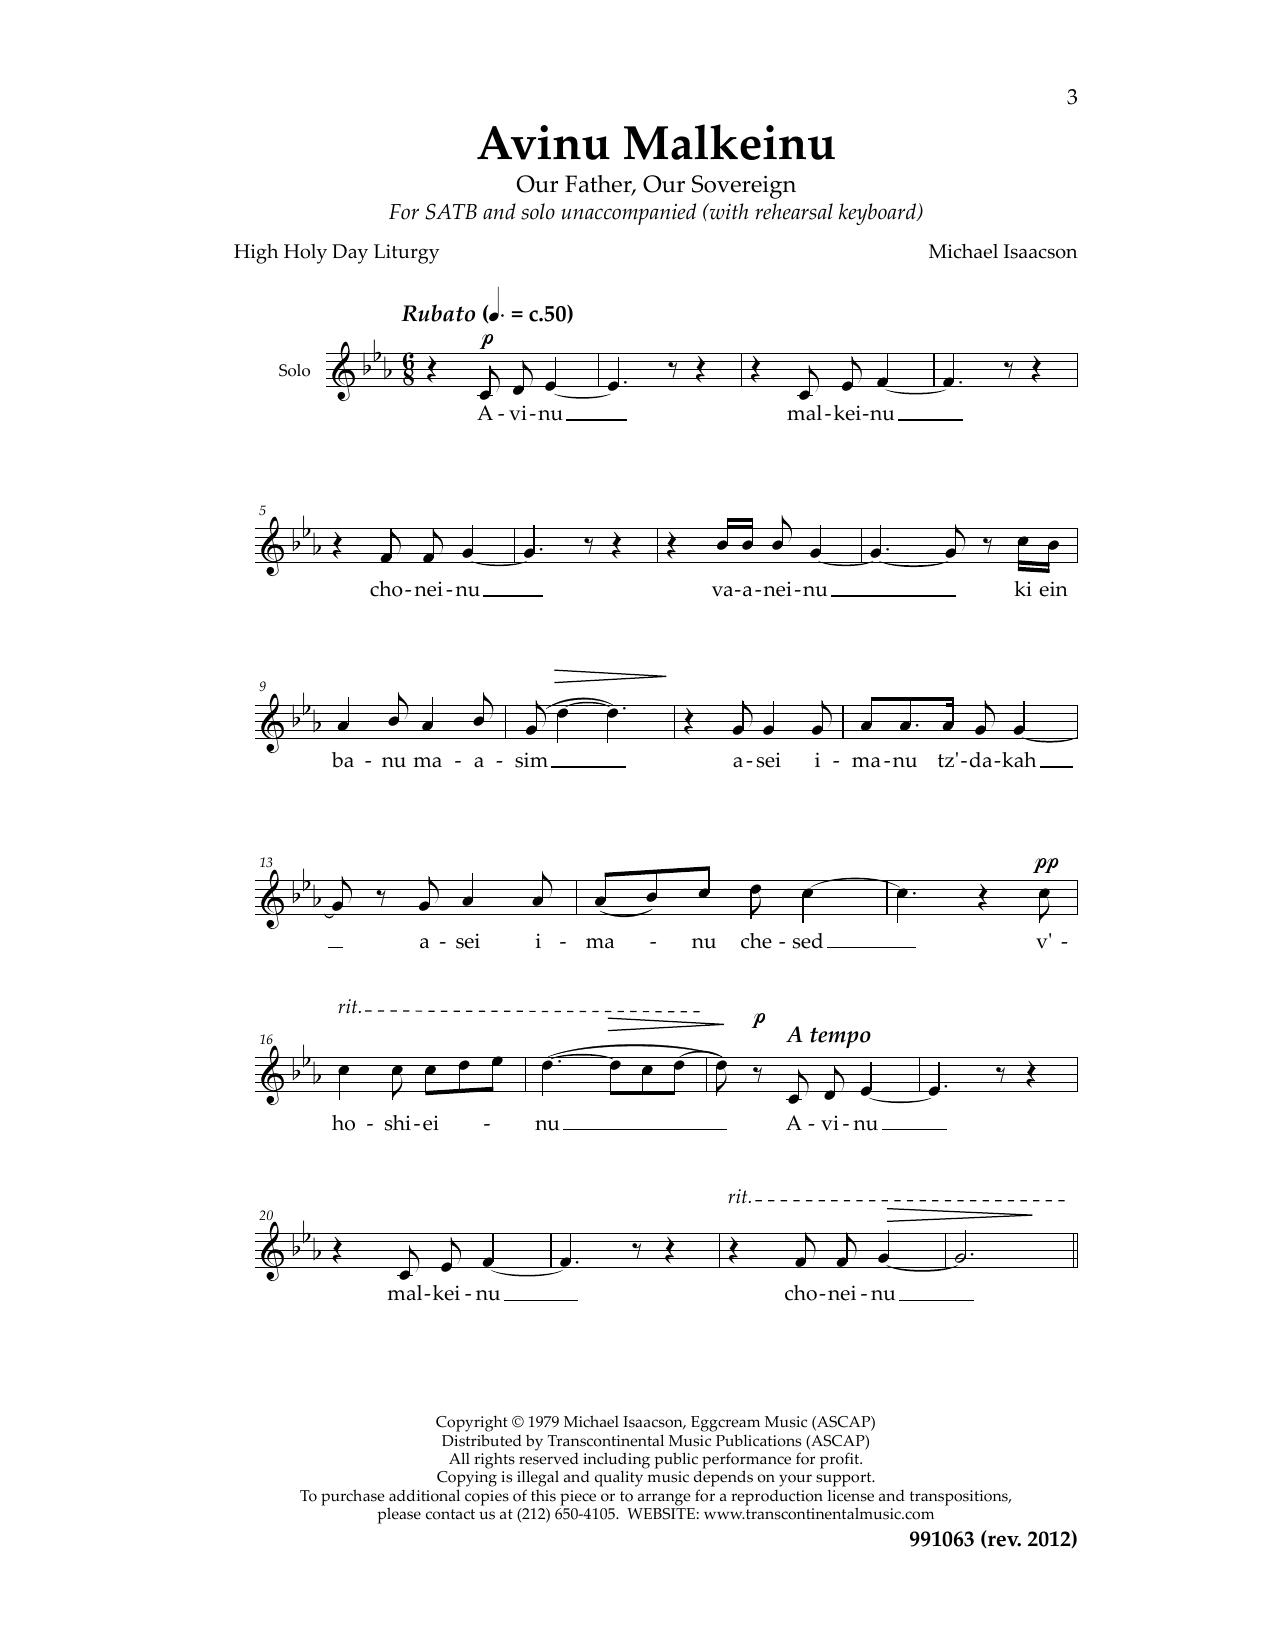 Avinu Malkeinu Cantor Sheet Music